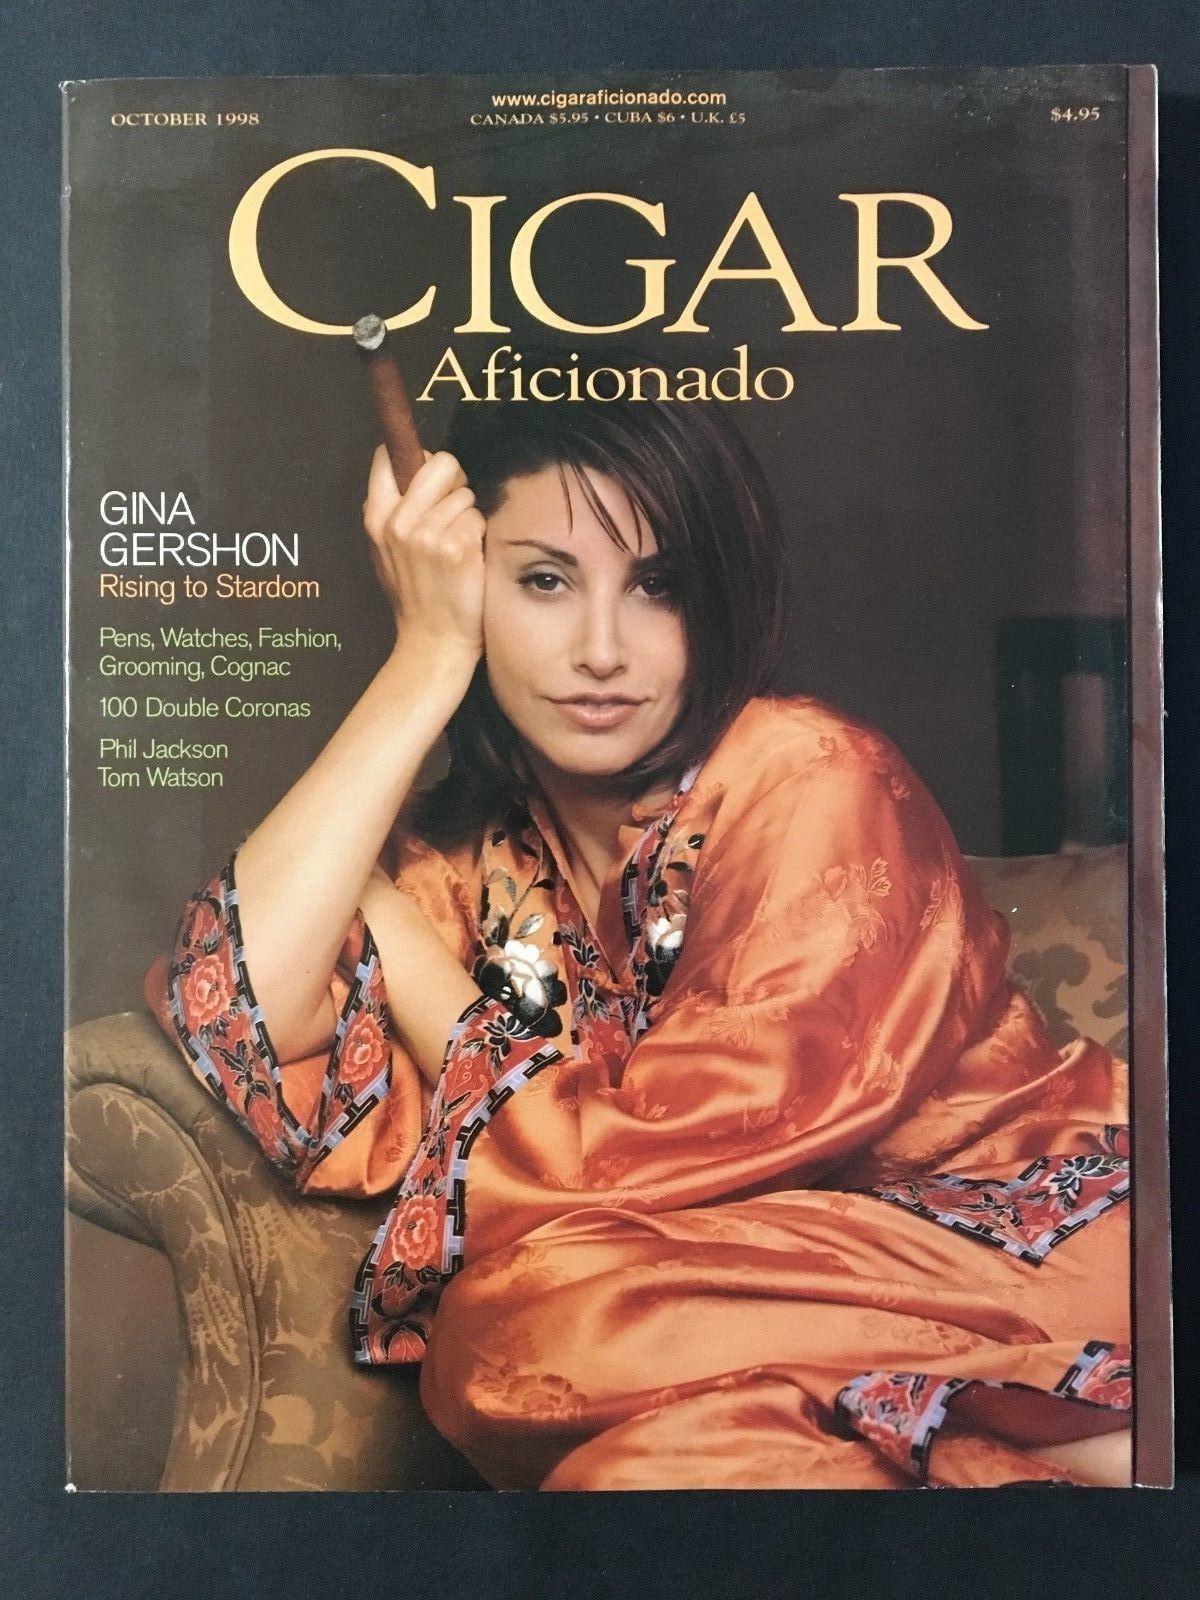 cigar-aficionado-magazine-october-1998-gina-gershon.jpg